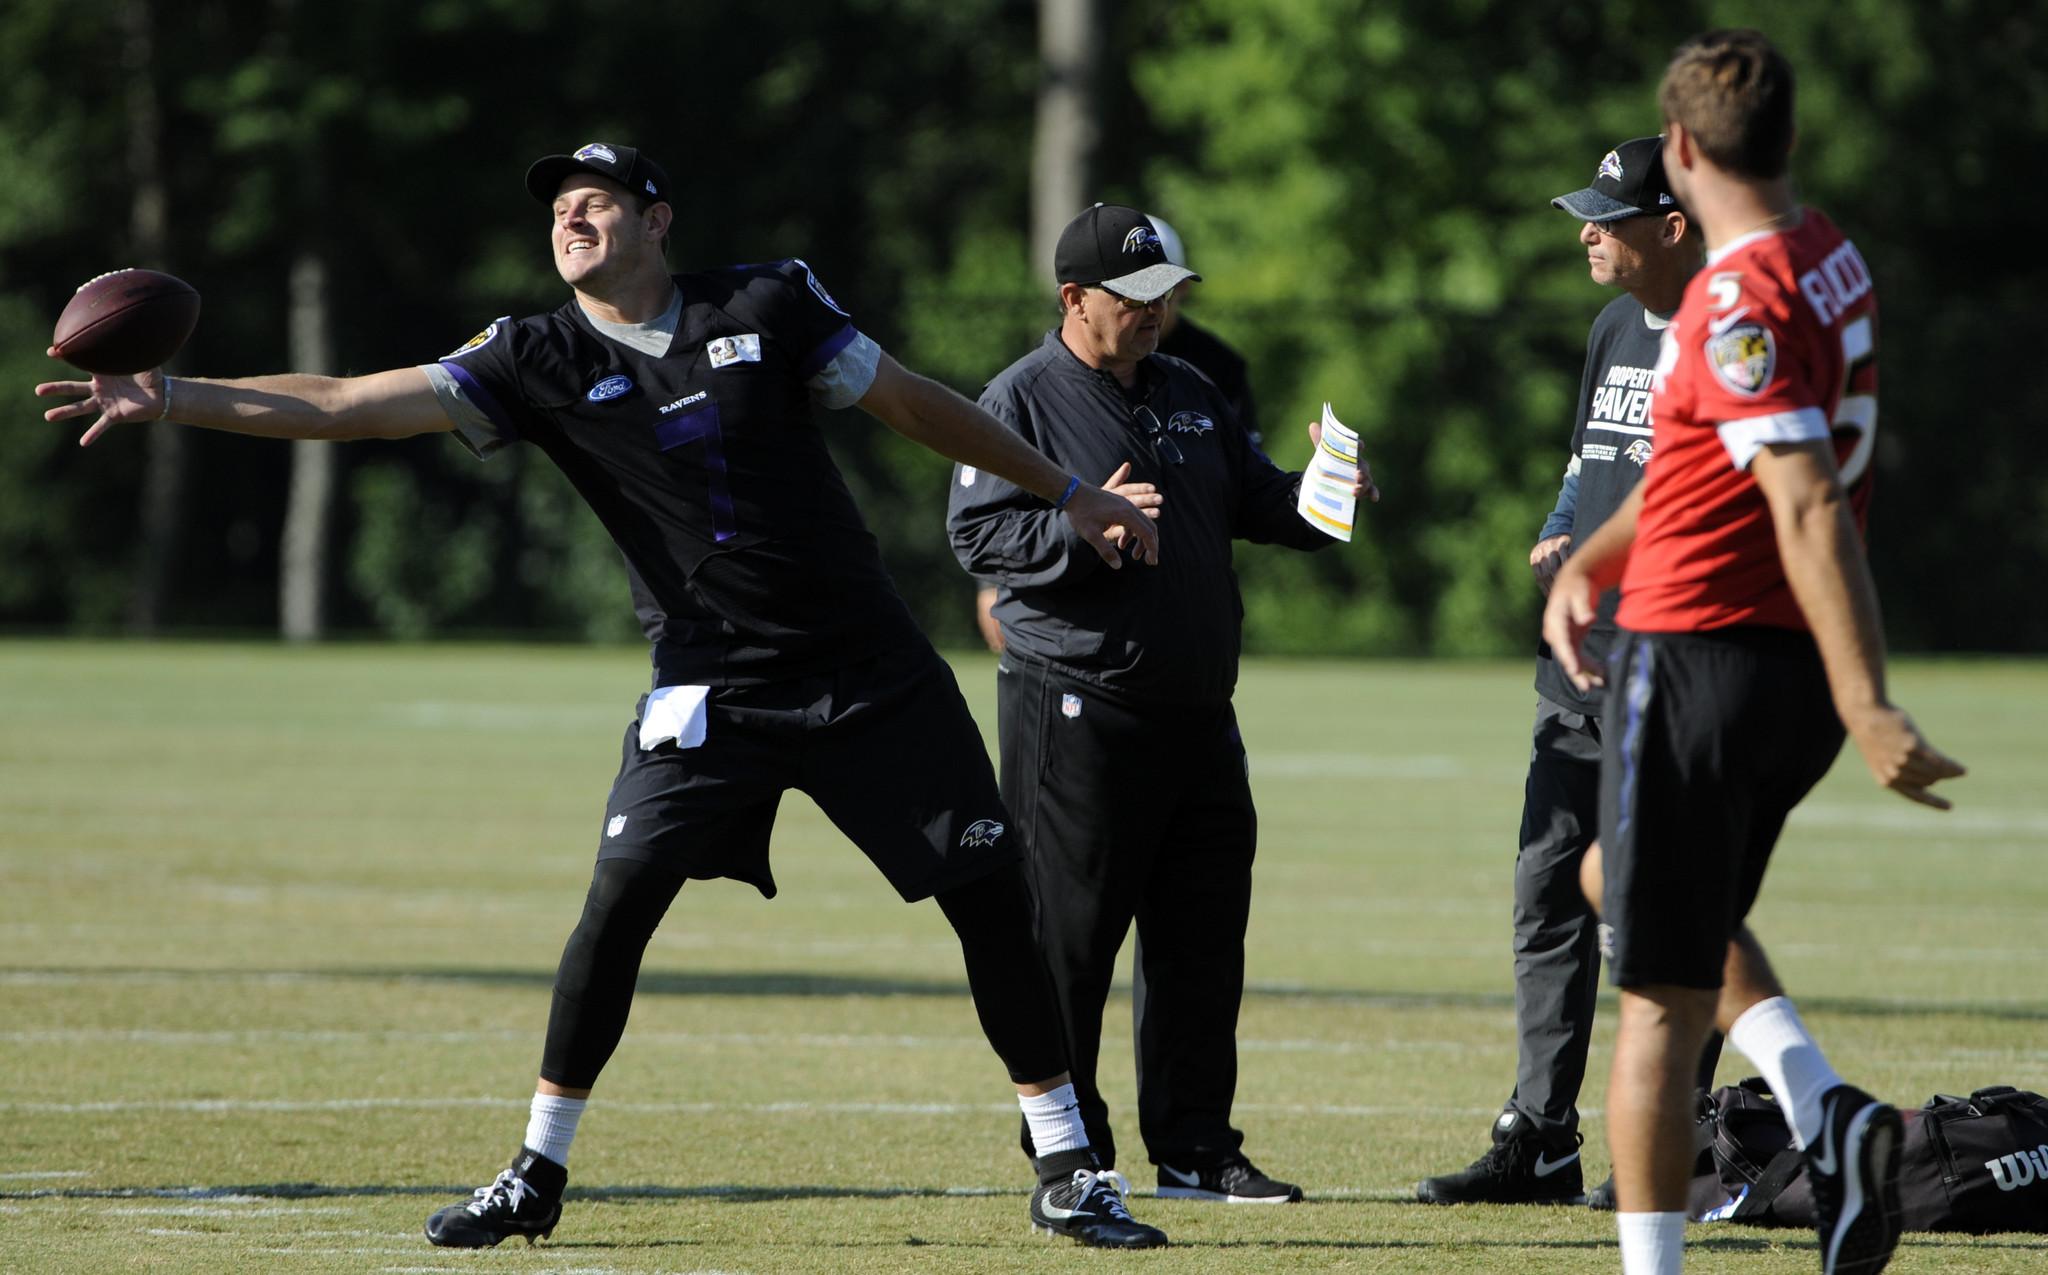 Bs-sp-ravens-training-camp-0810-20160809